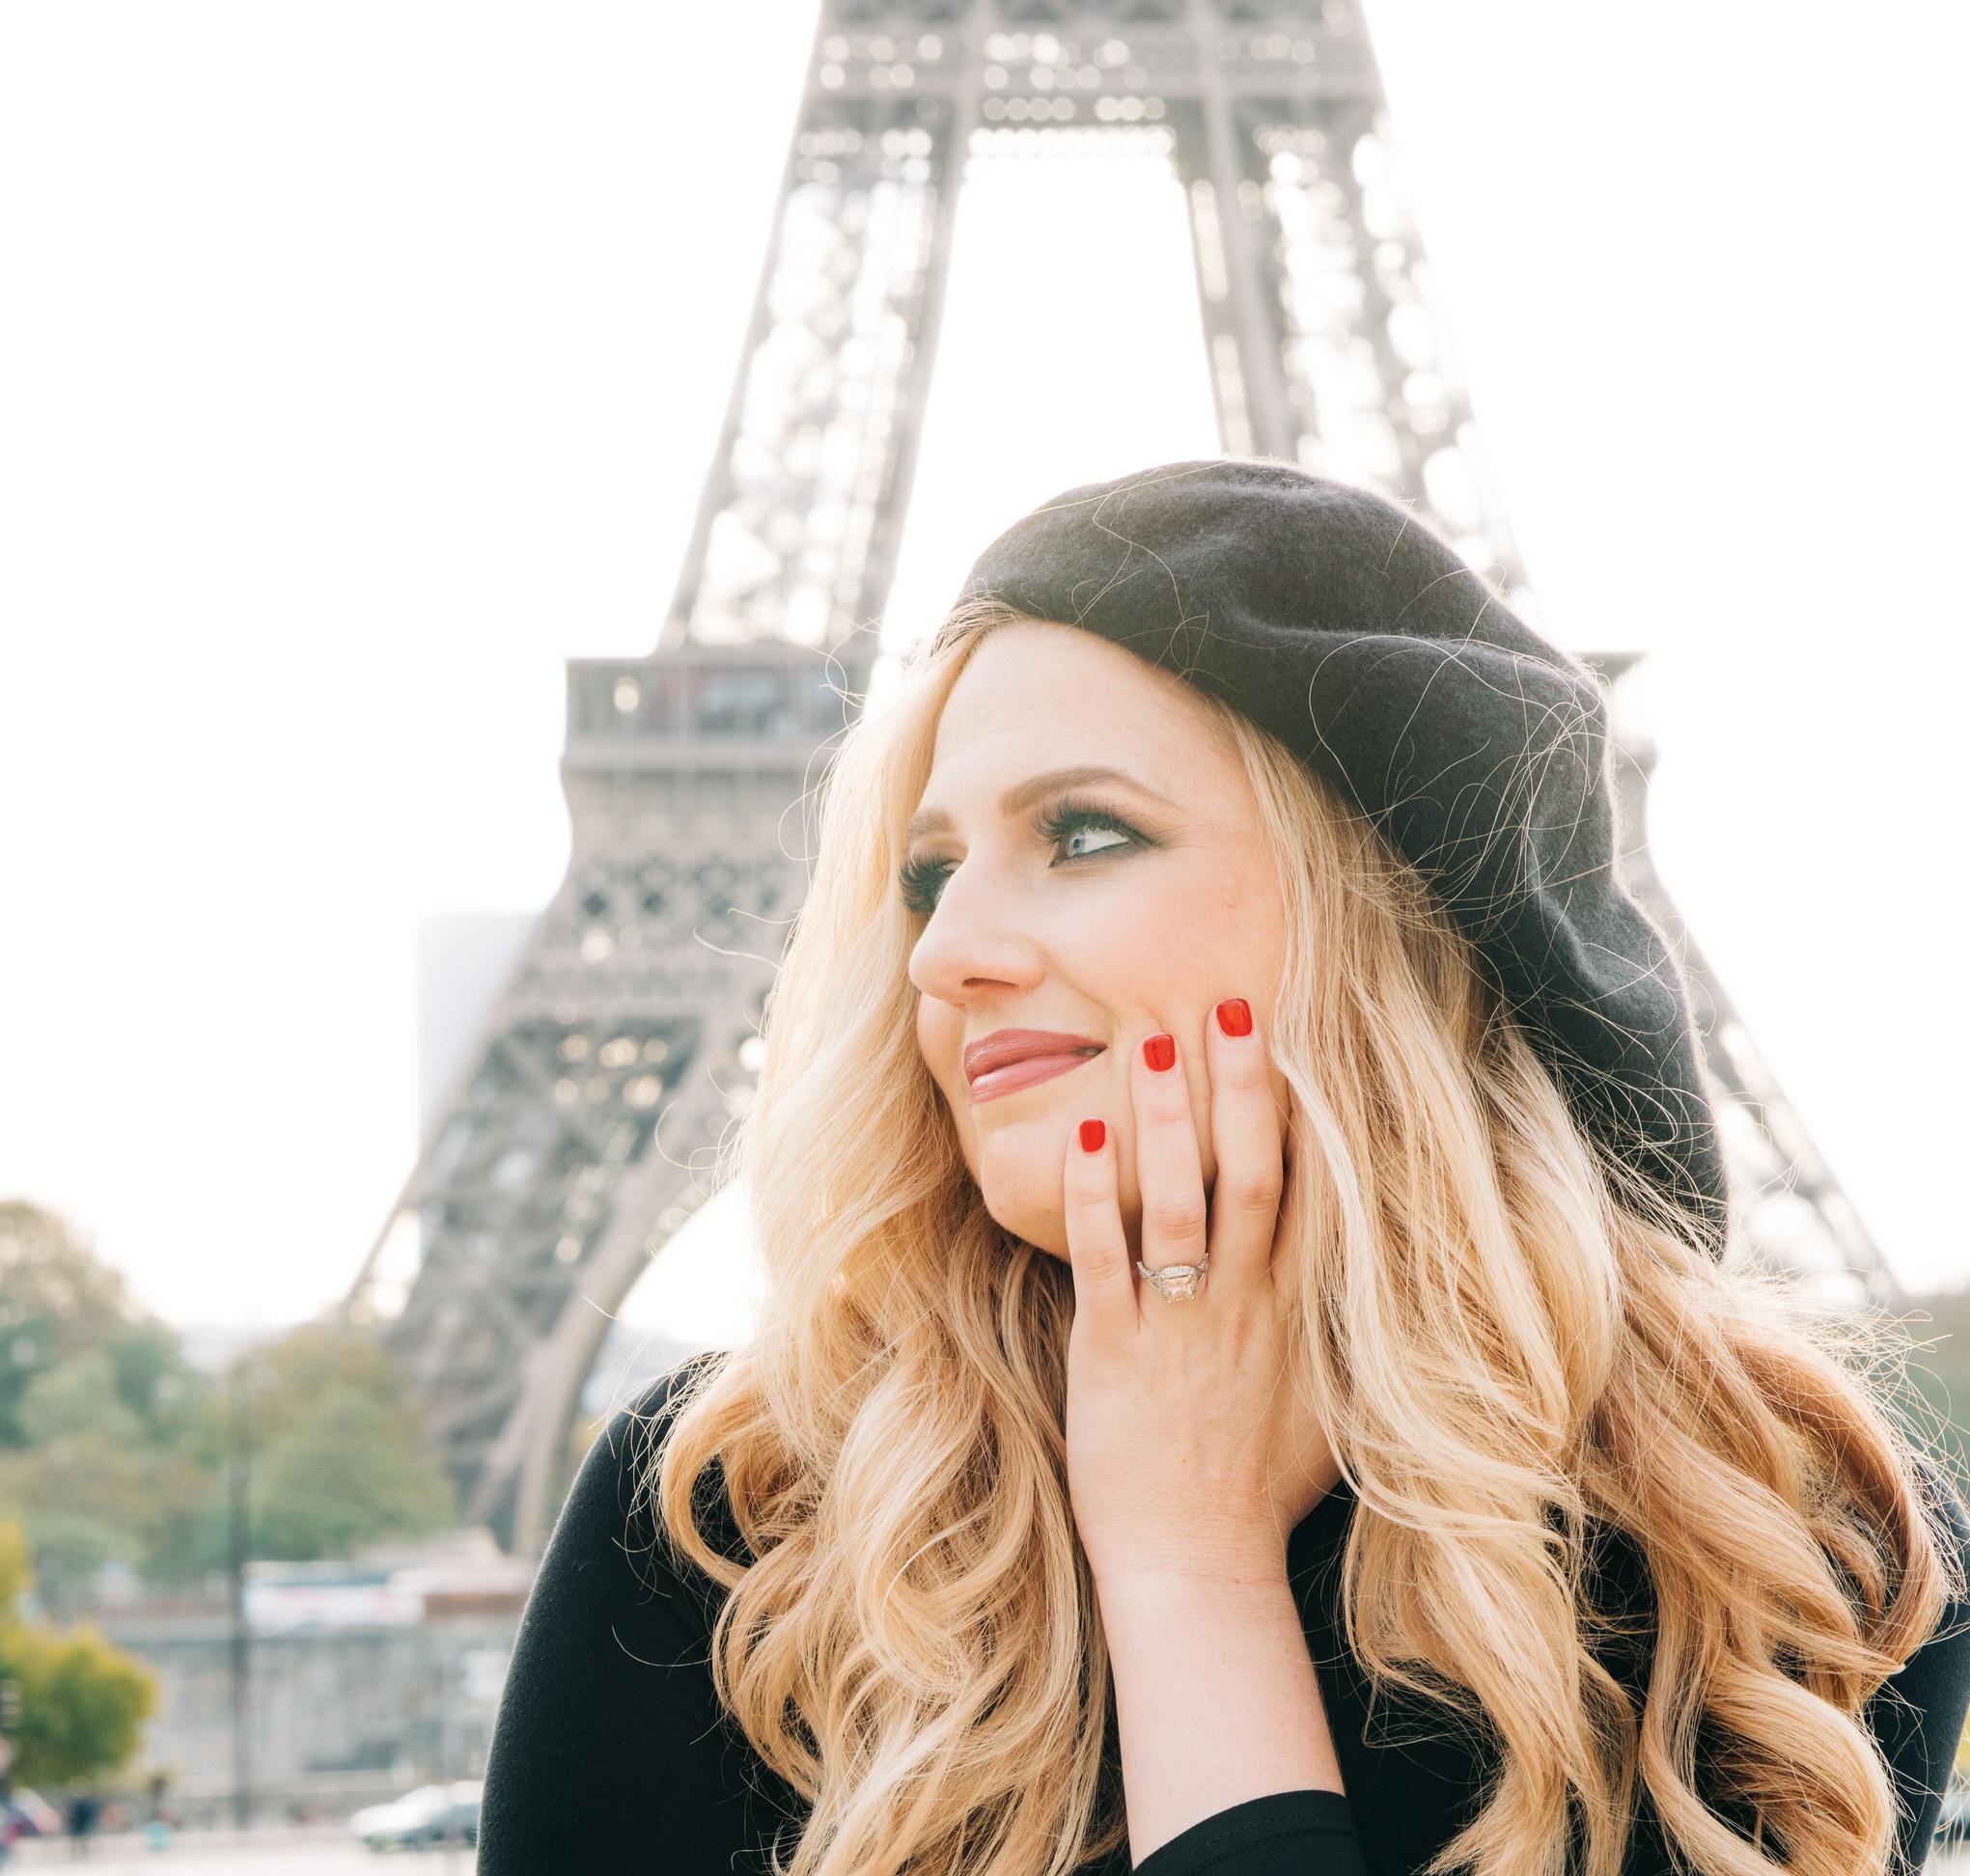 Hollywood glam in Paris